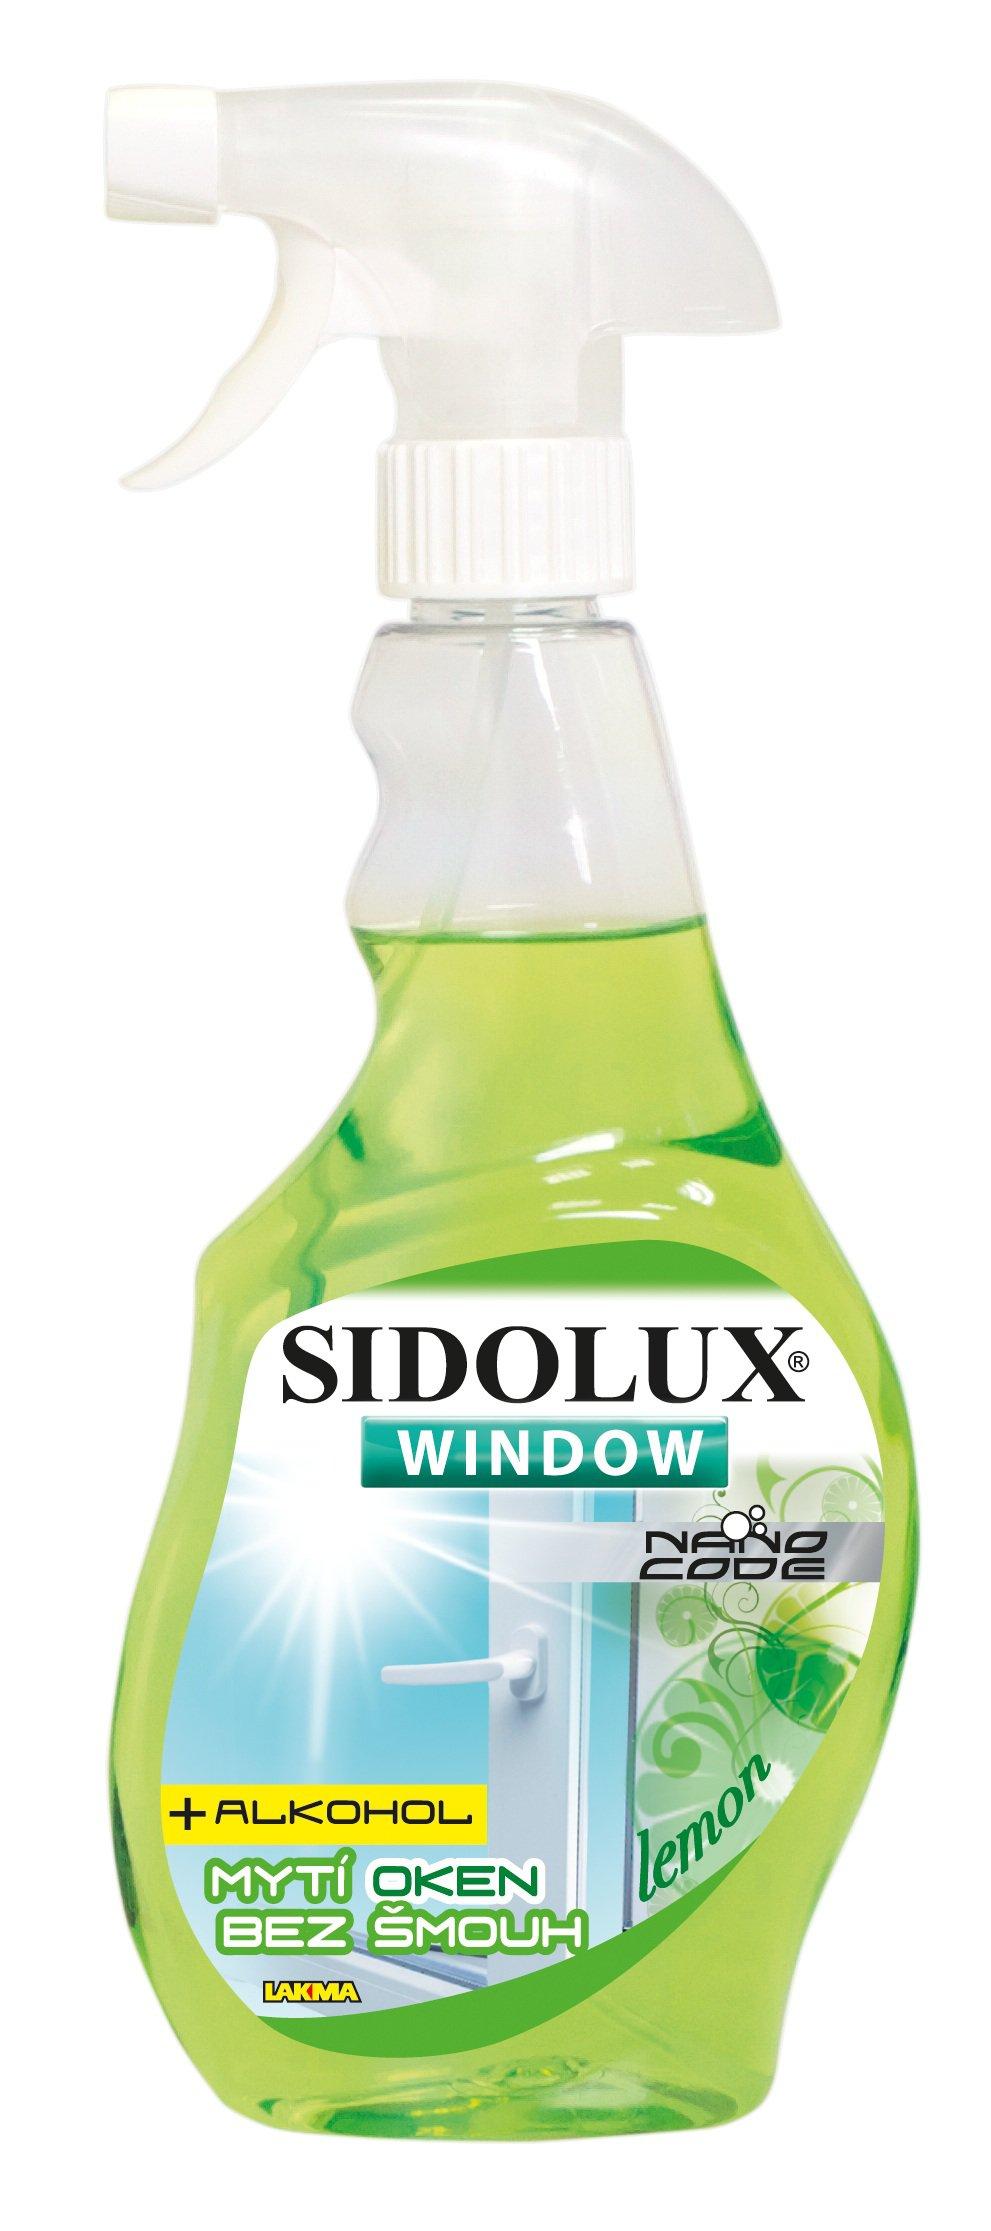 Sidolux Nano code čistič oken Lemon 500 ml